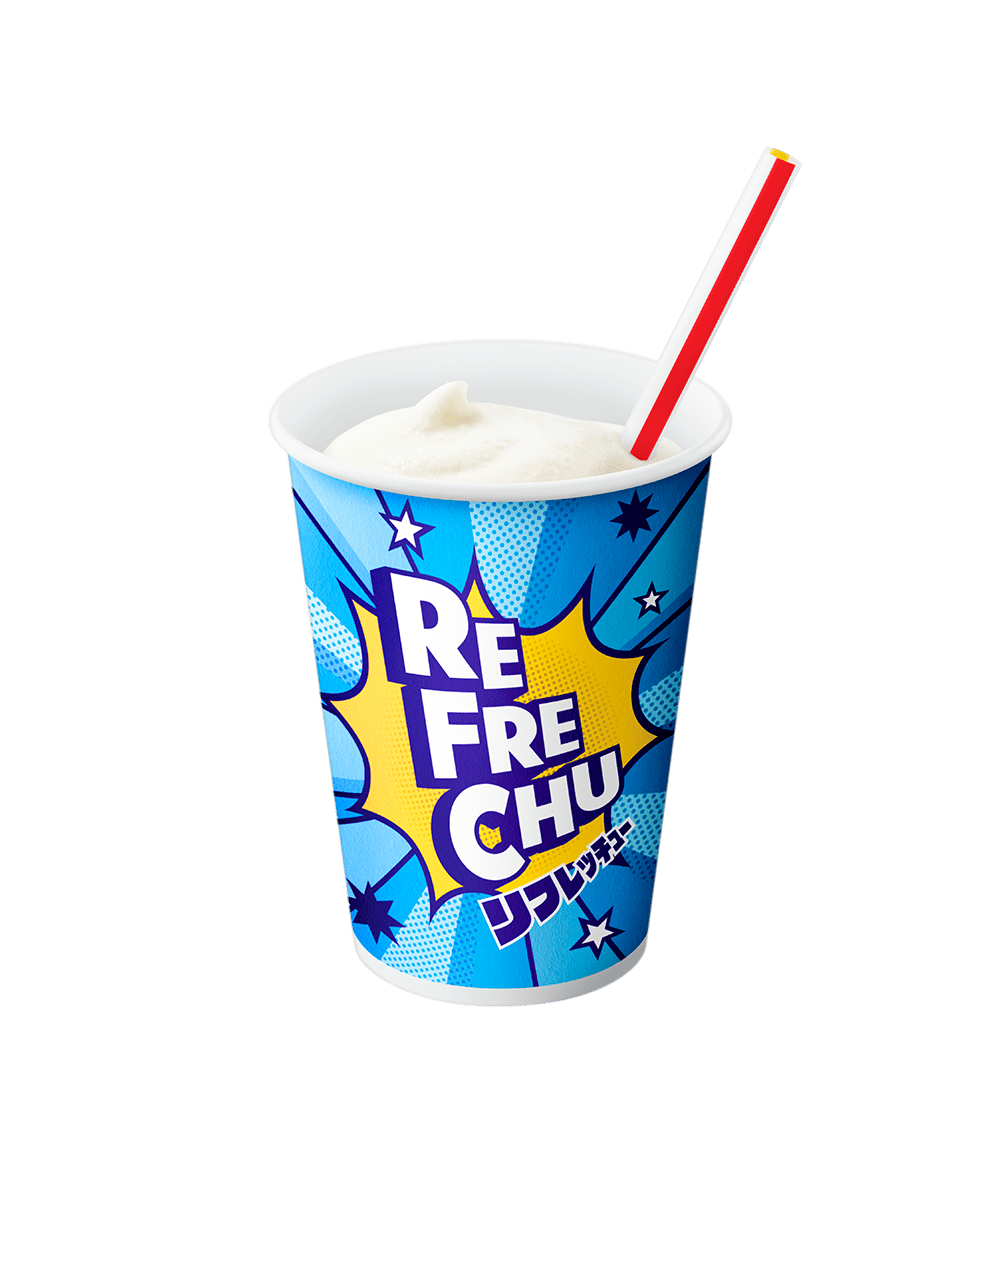 %e3%83%9e%e3%83%83%e3%82%af%e3%82%b7%e3%82%a7%e3%82%a4%e3%82%af-%e3%83%a8%e3%83%bc%e3%82%b0%e3%83%ab%e3%83%88%e5%91%b3-mac-shake-yogurt-min